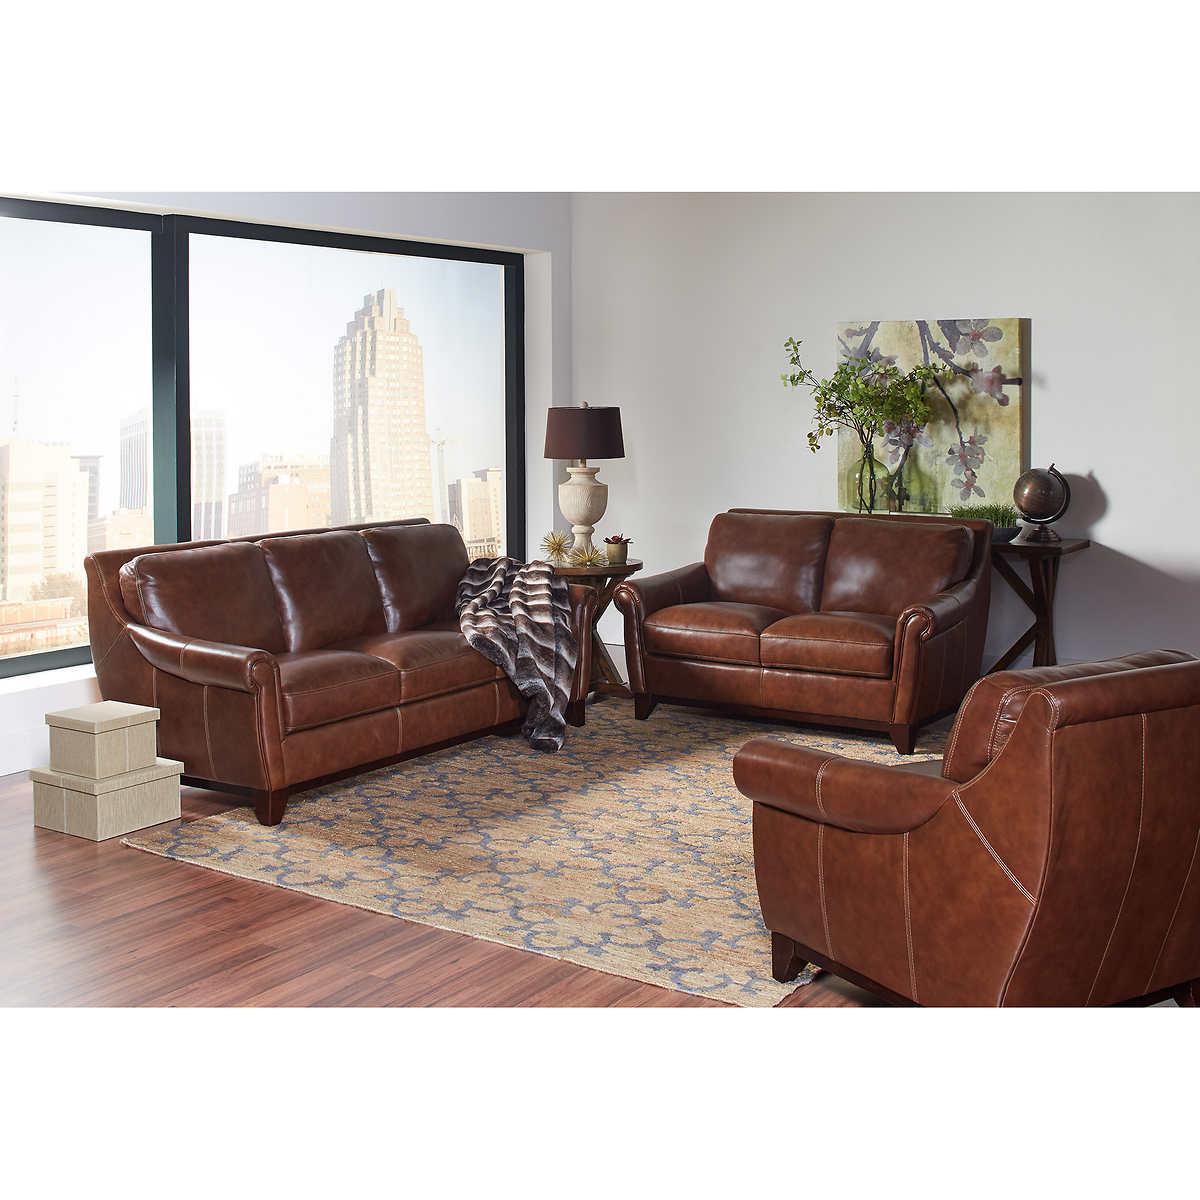 Crofton 3-piece Top Grain Leather Living Room Set